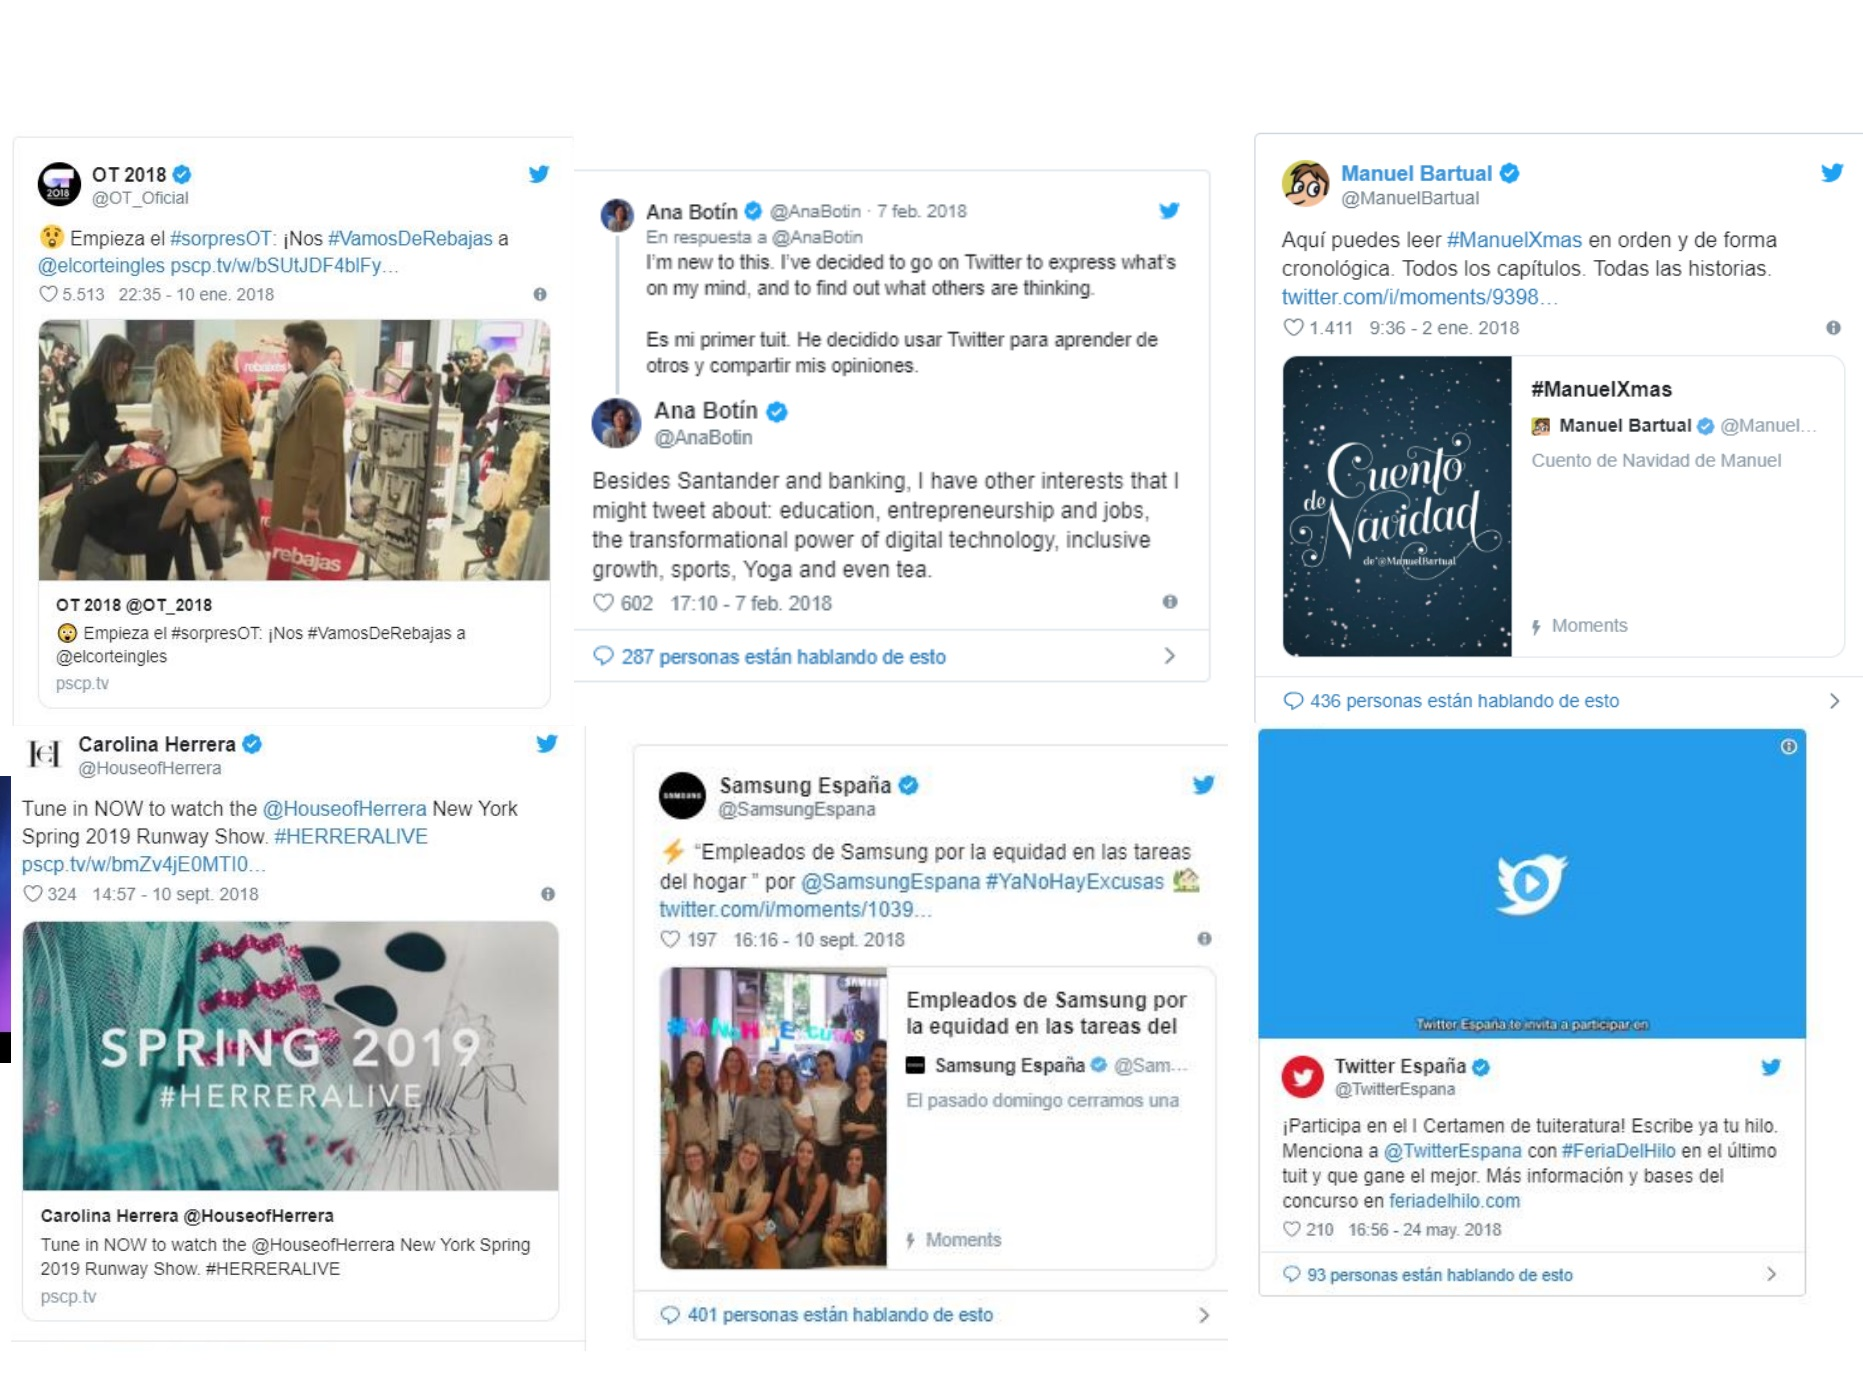 http://www.programapublicidad.com/wp-content/uploads/2018/12/2018-EstoSucedió-marcas-Twitter-programapublicidad-muy-grande.jpg